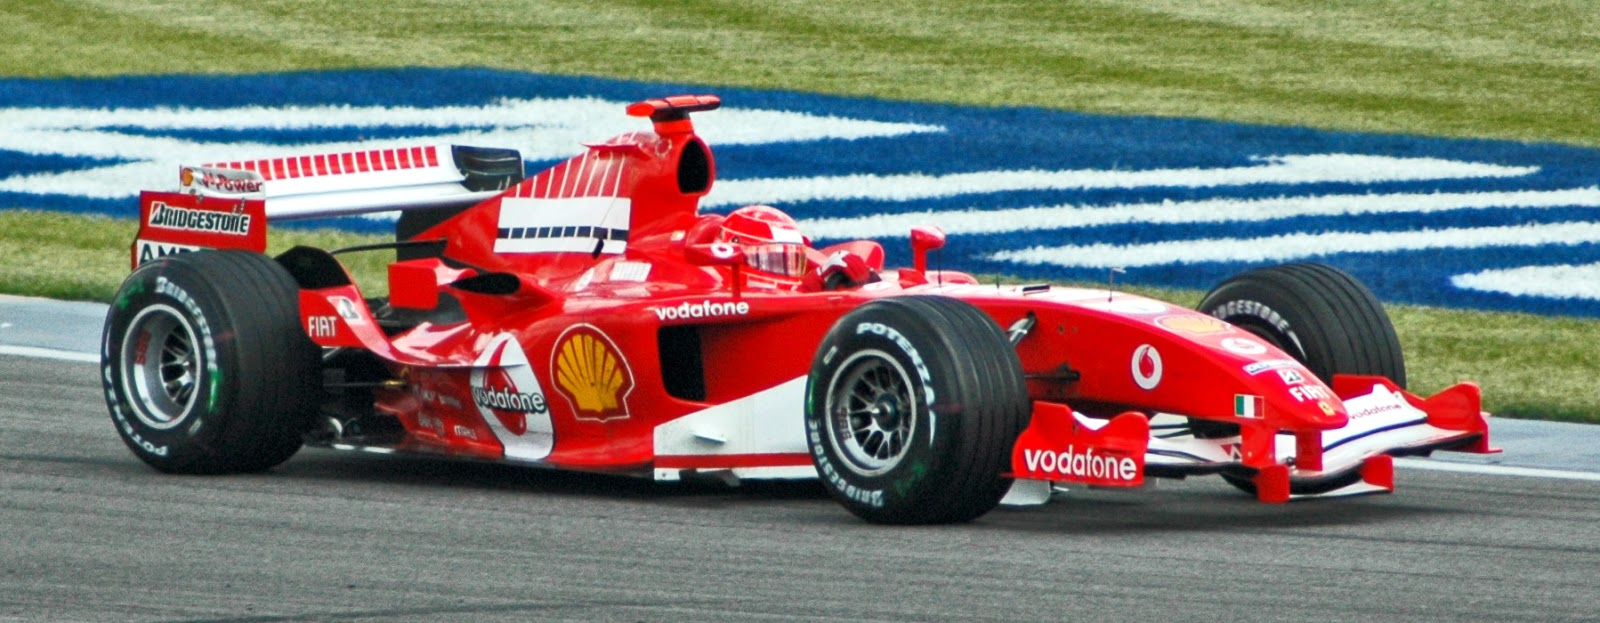 Schumacher 2013 Ferrari Schumacher Did at Ferrari